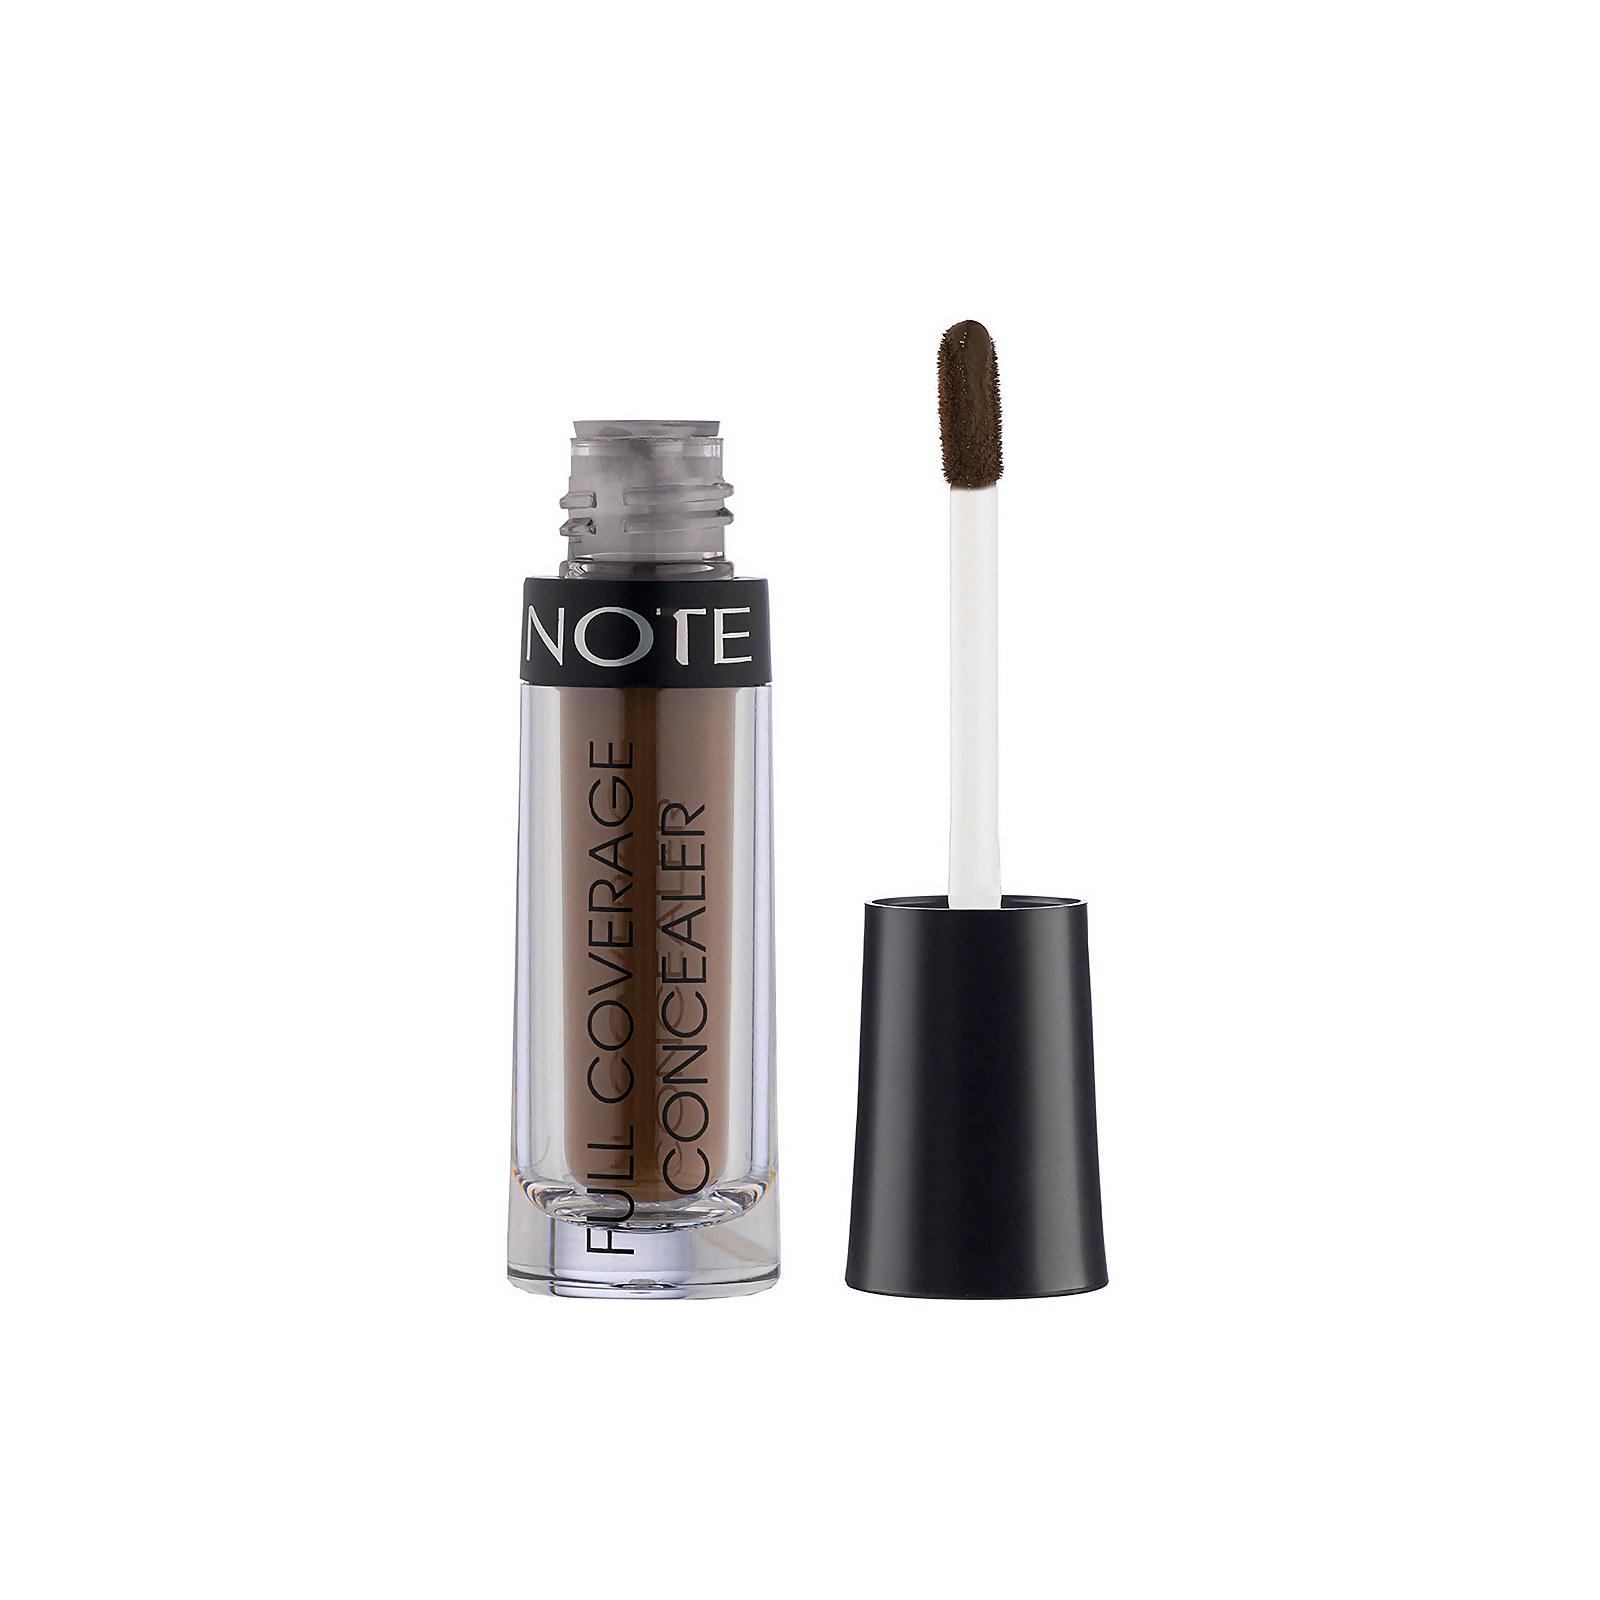 Купить Жидкий консилер Note Cosmetics Full Coverage Liquid Concealer 2, 3 мл (различные оттенки) - 404 Dark Cocoa